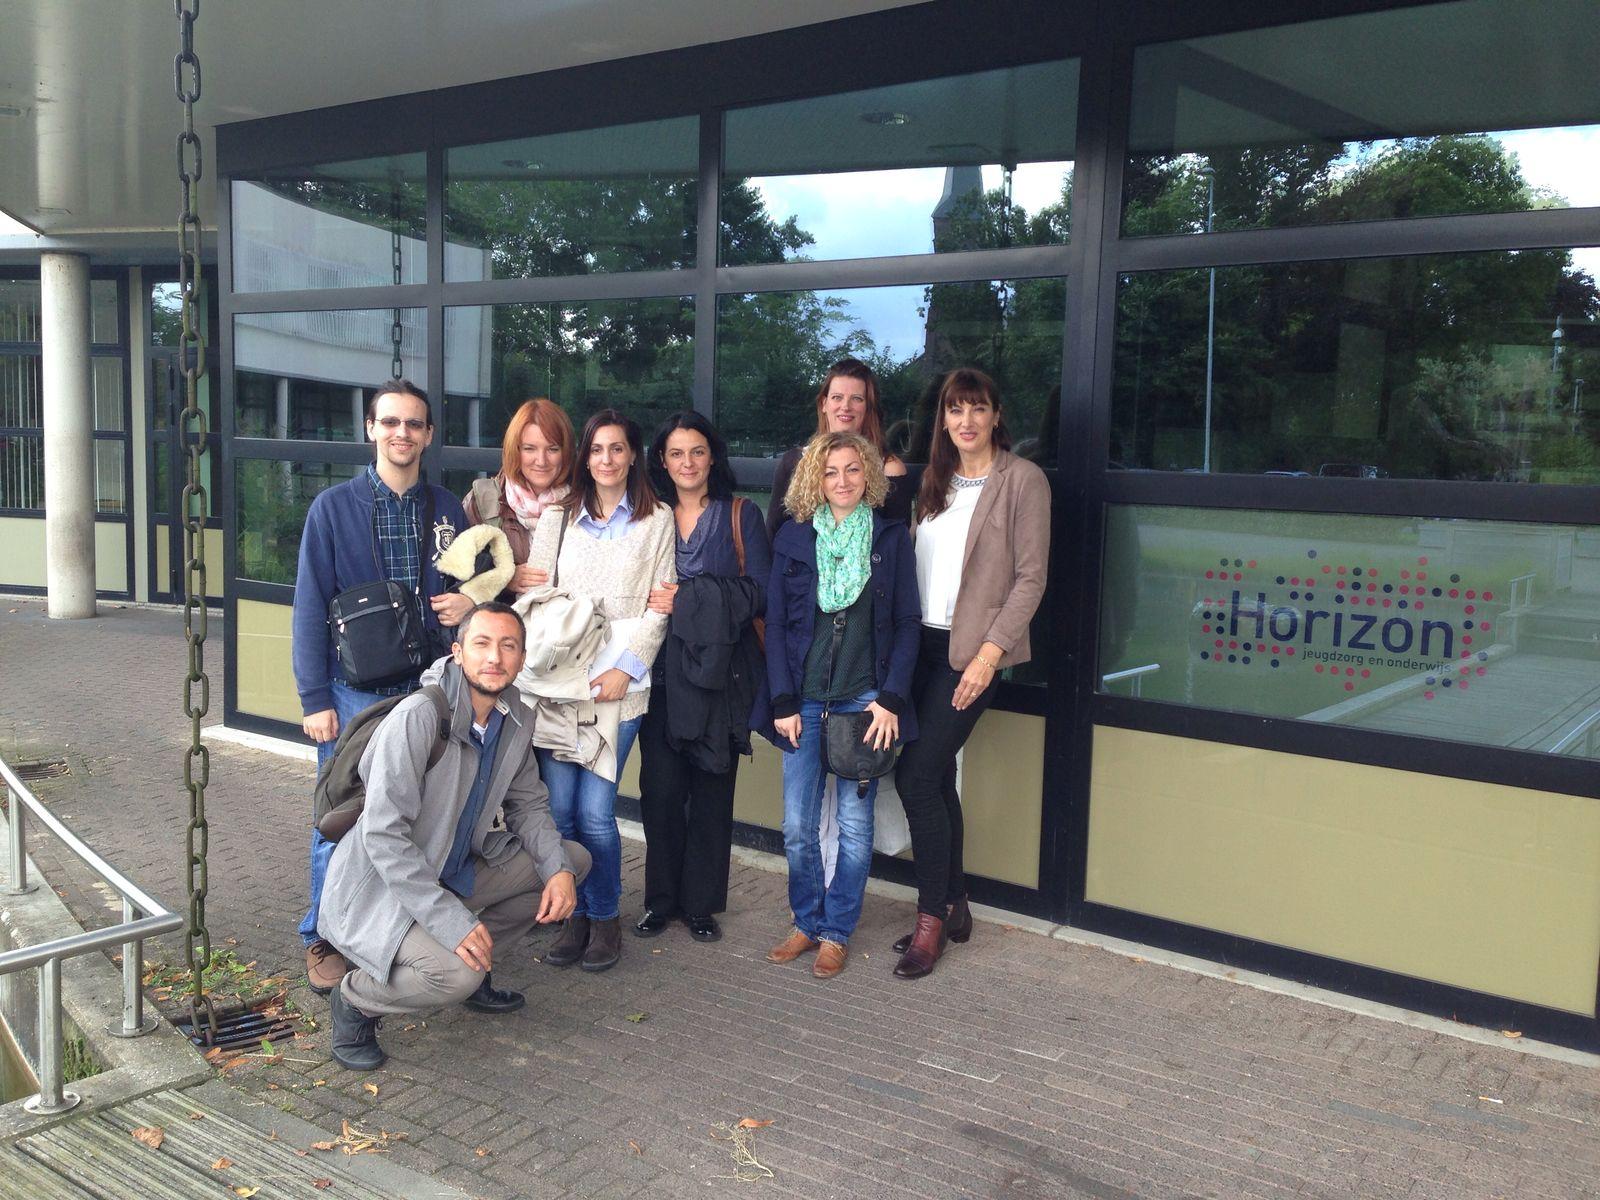 Servische delegatie bezoekt Nederland